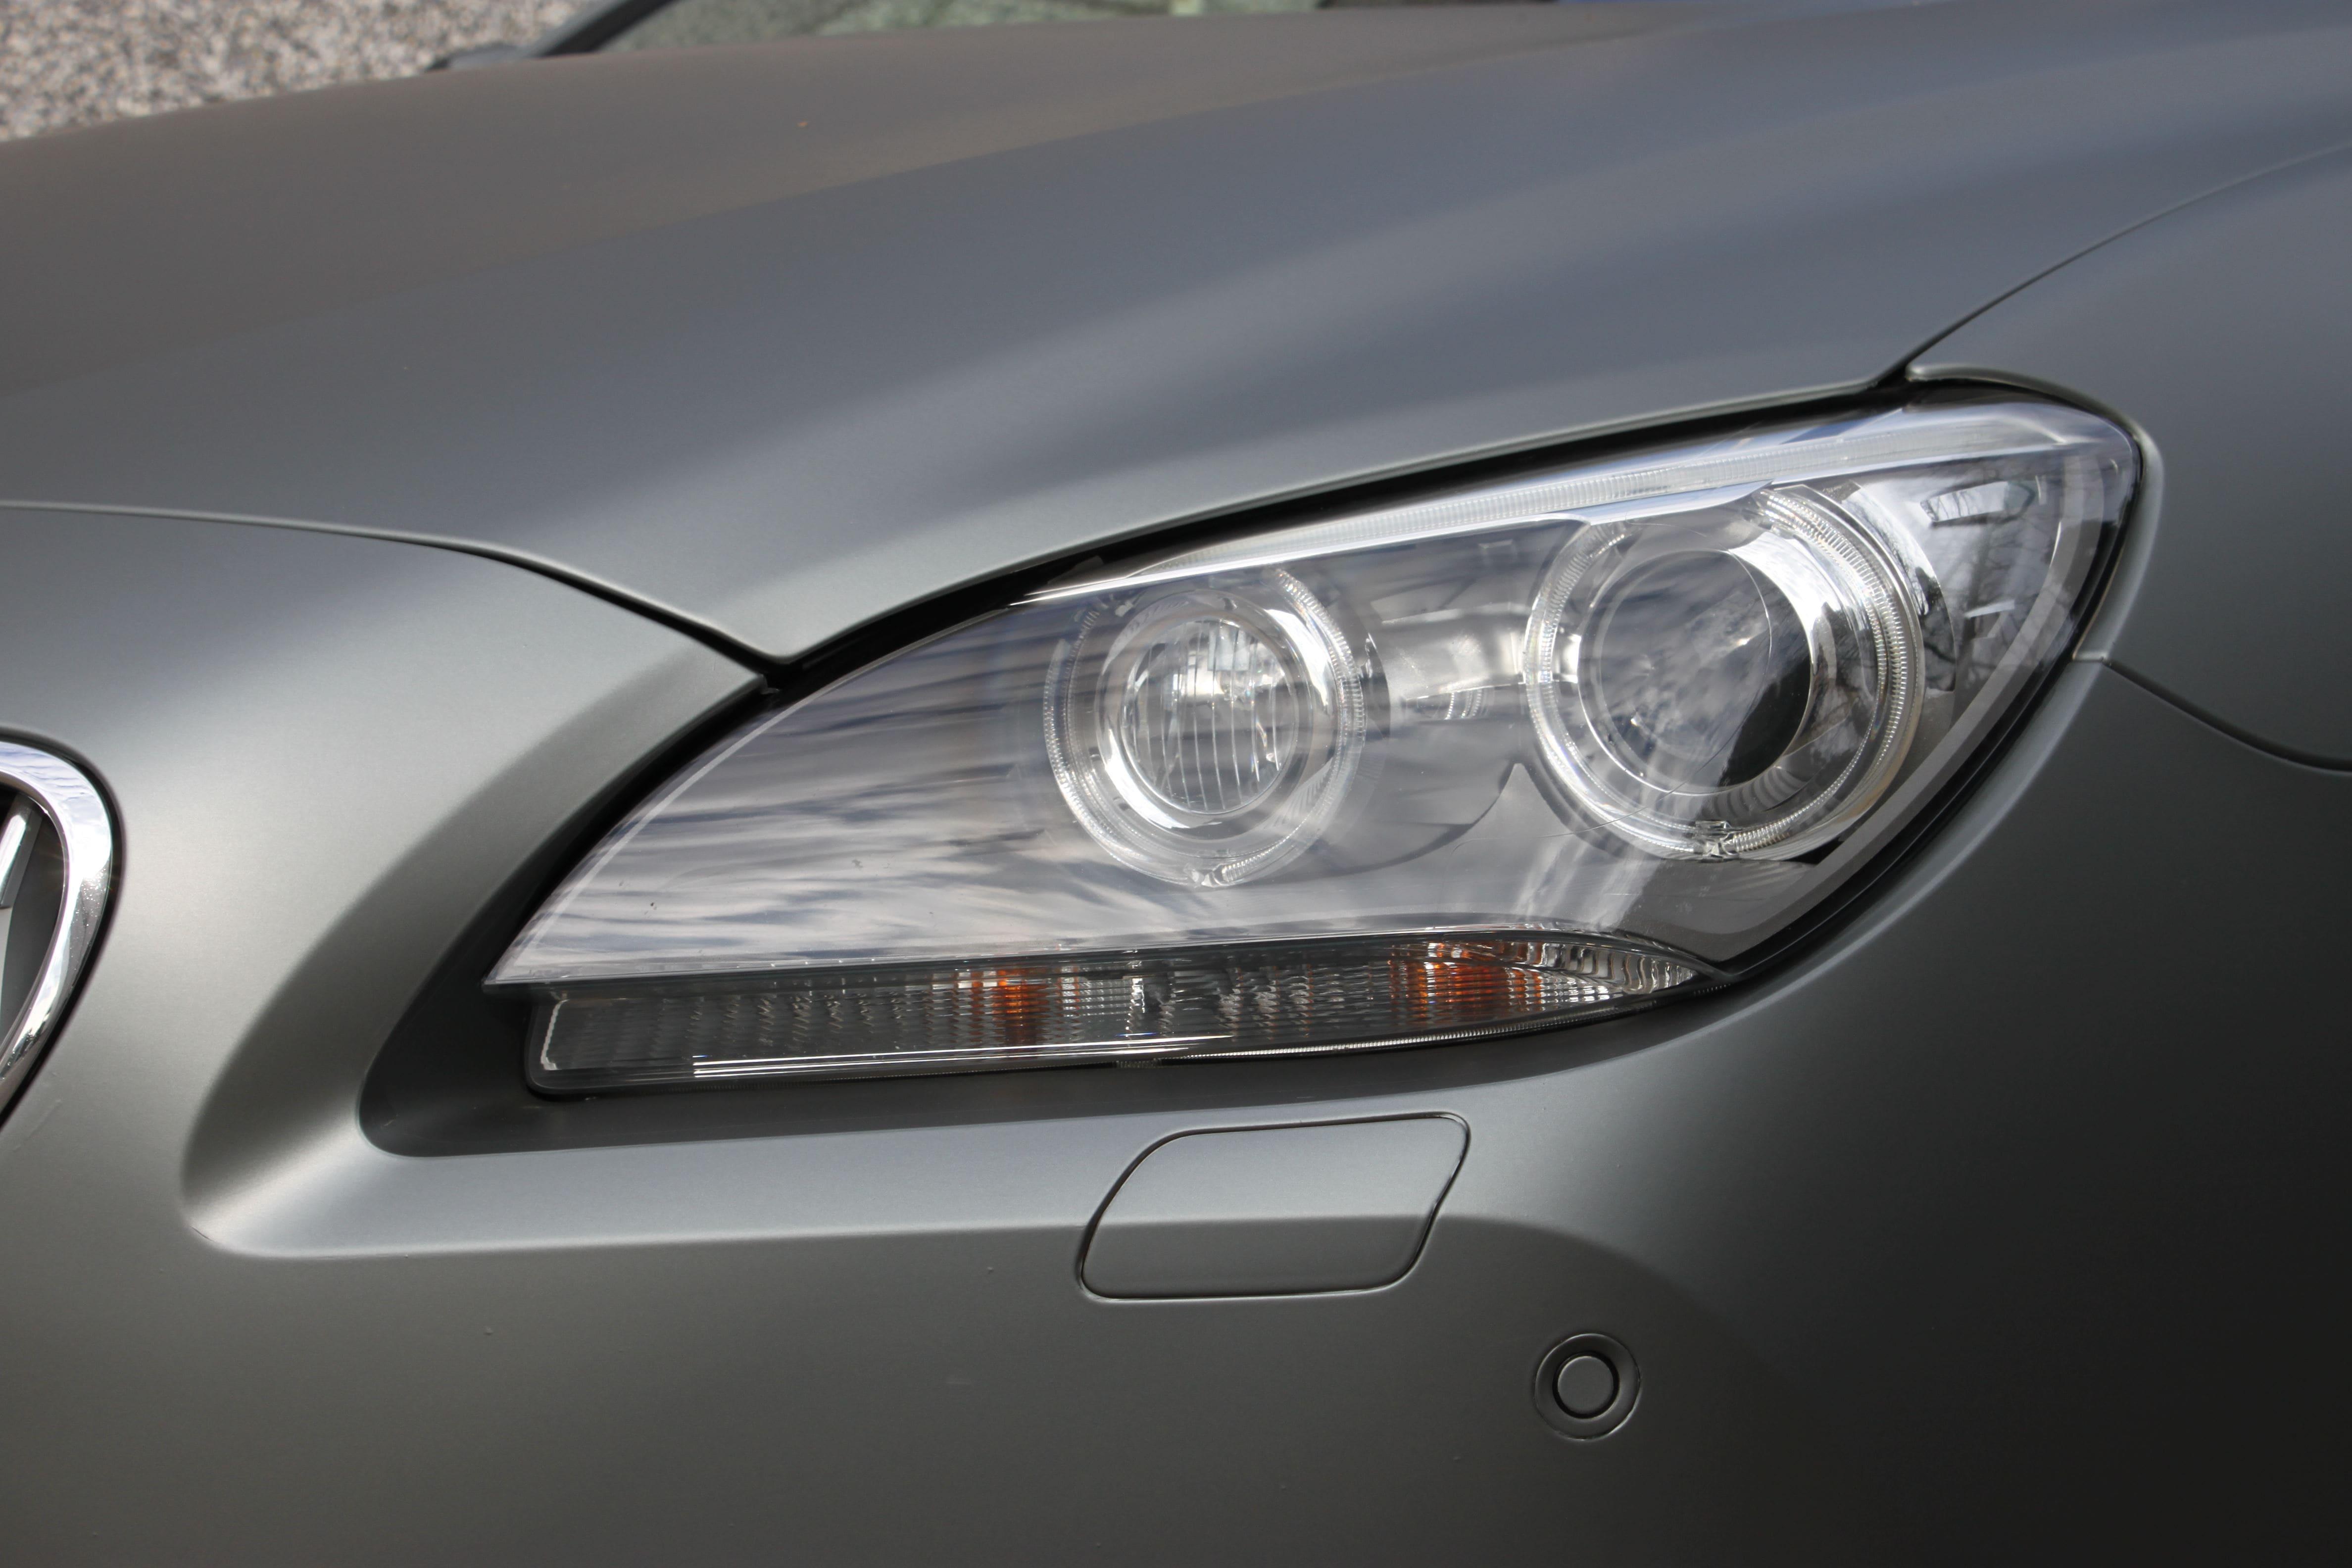 BMW 650i met Mat Antraciet Metallic Avery Wrap, Carwrapping door Wrapmyride.nu Foto-nr:5282, ©2020